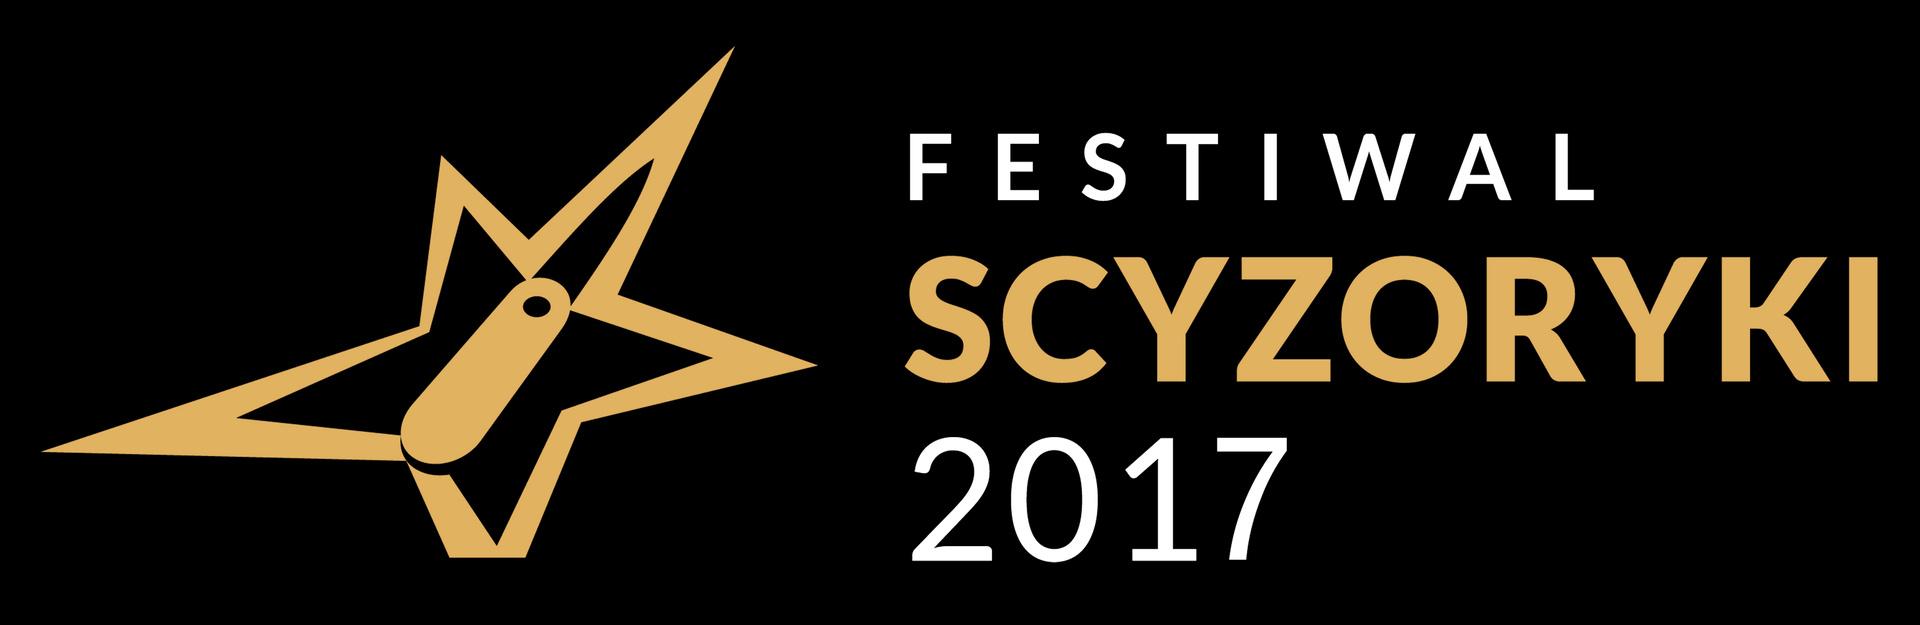 Festiwal Scyzoryki